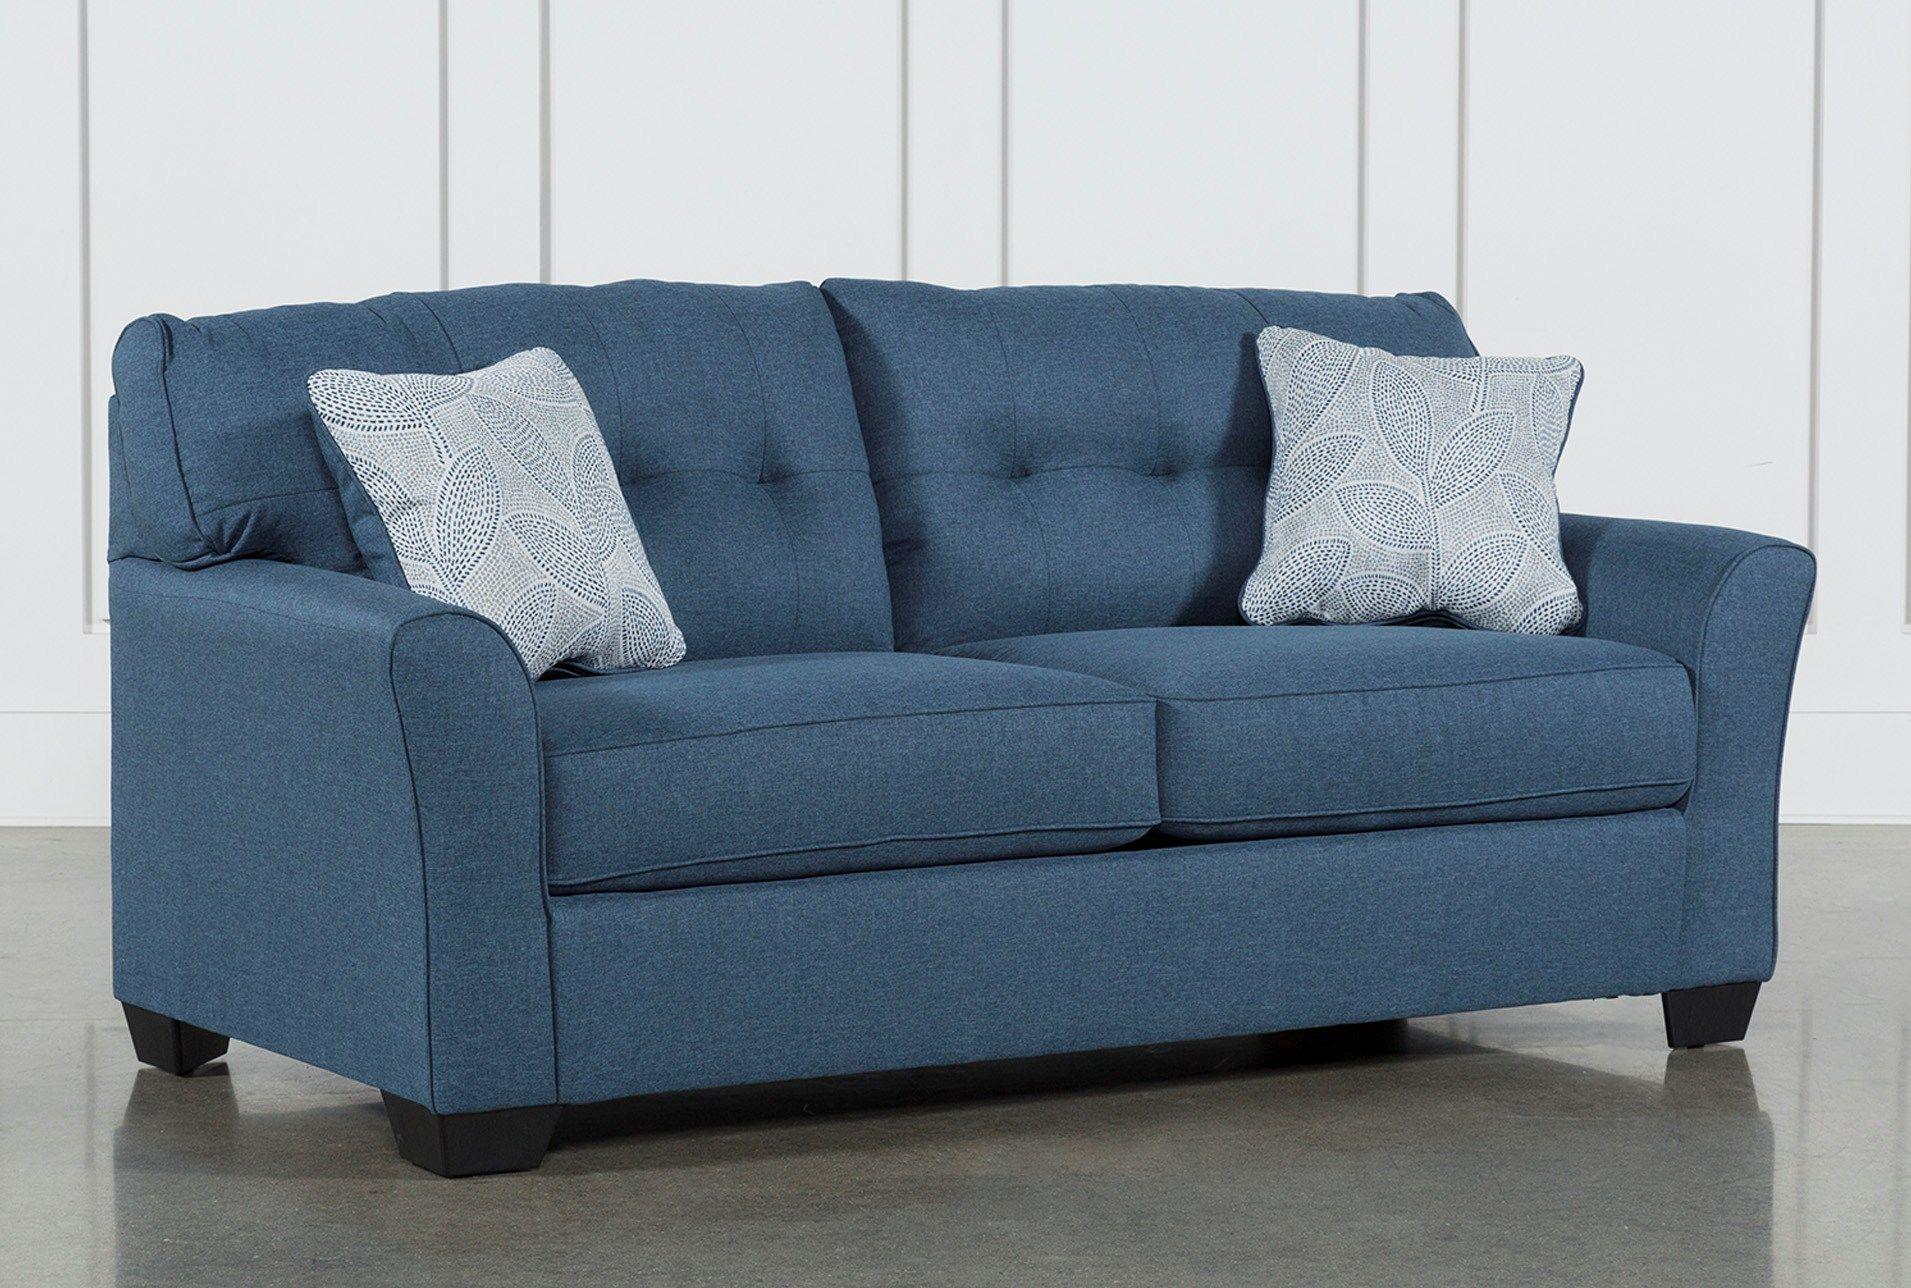 Grande Denim Blue Sleeper Sofa Di 2020 Dengan Gambar